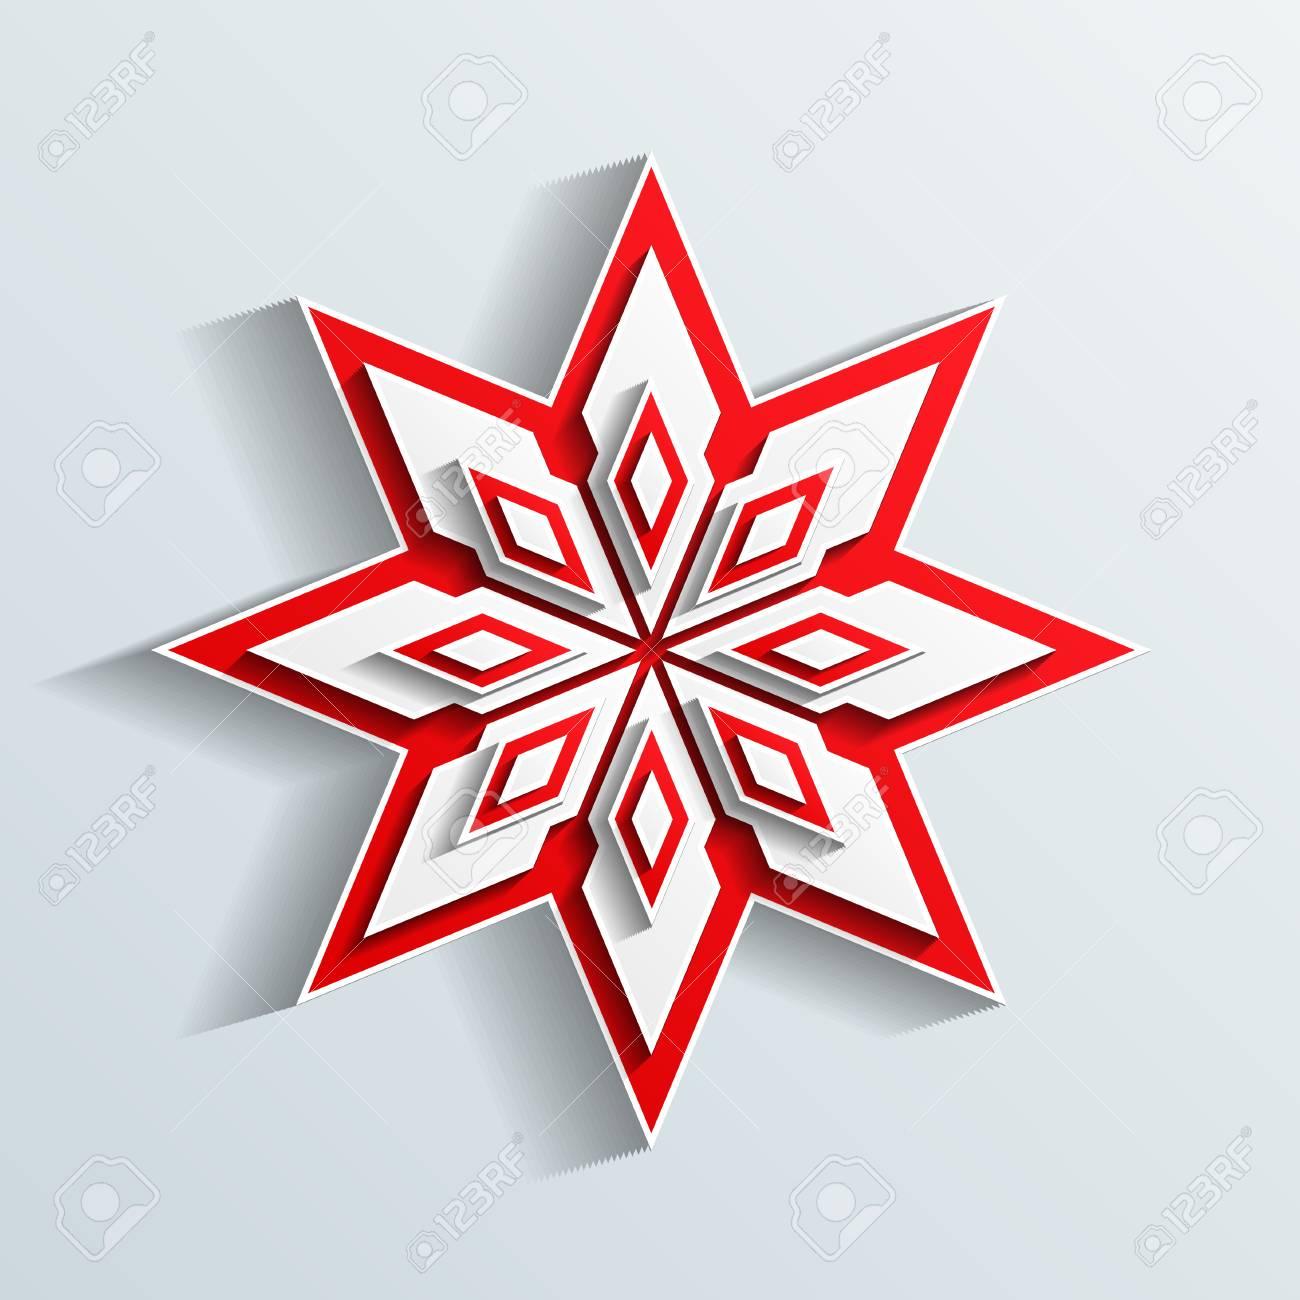 Vektor Schnee~~POS=TRUNC Flocke~~POS=HEADCOMP Lizenzfrei Nutzbare ...